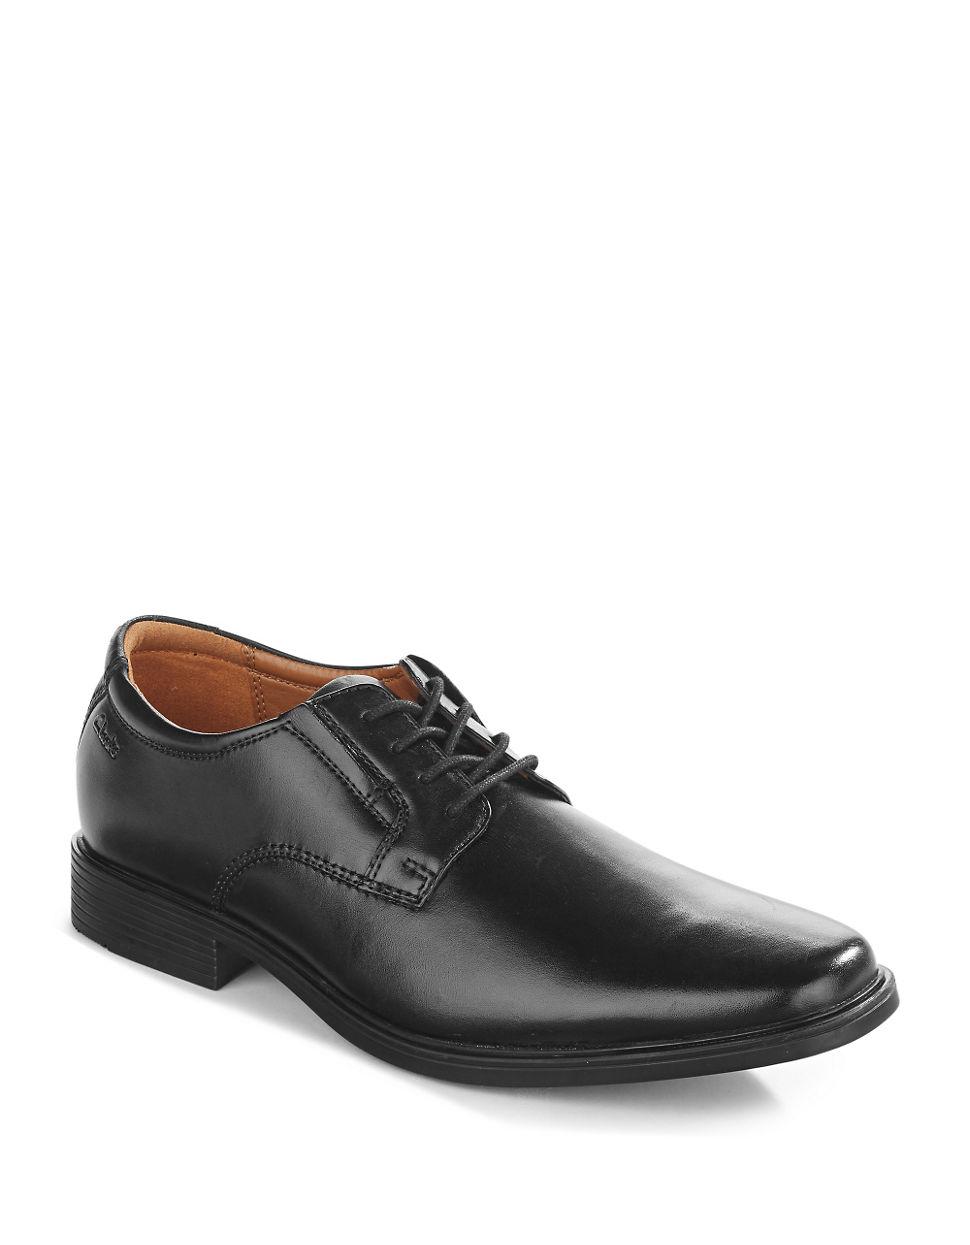 Tilden Classic Derby Dress Shoe